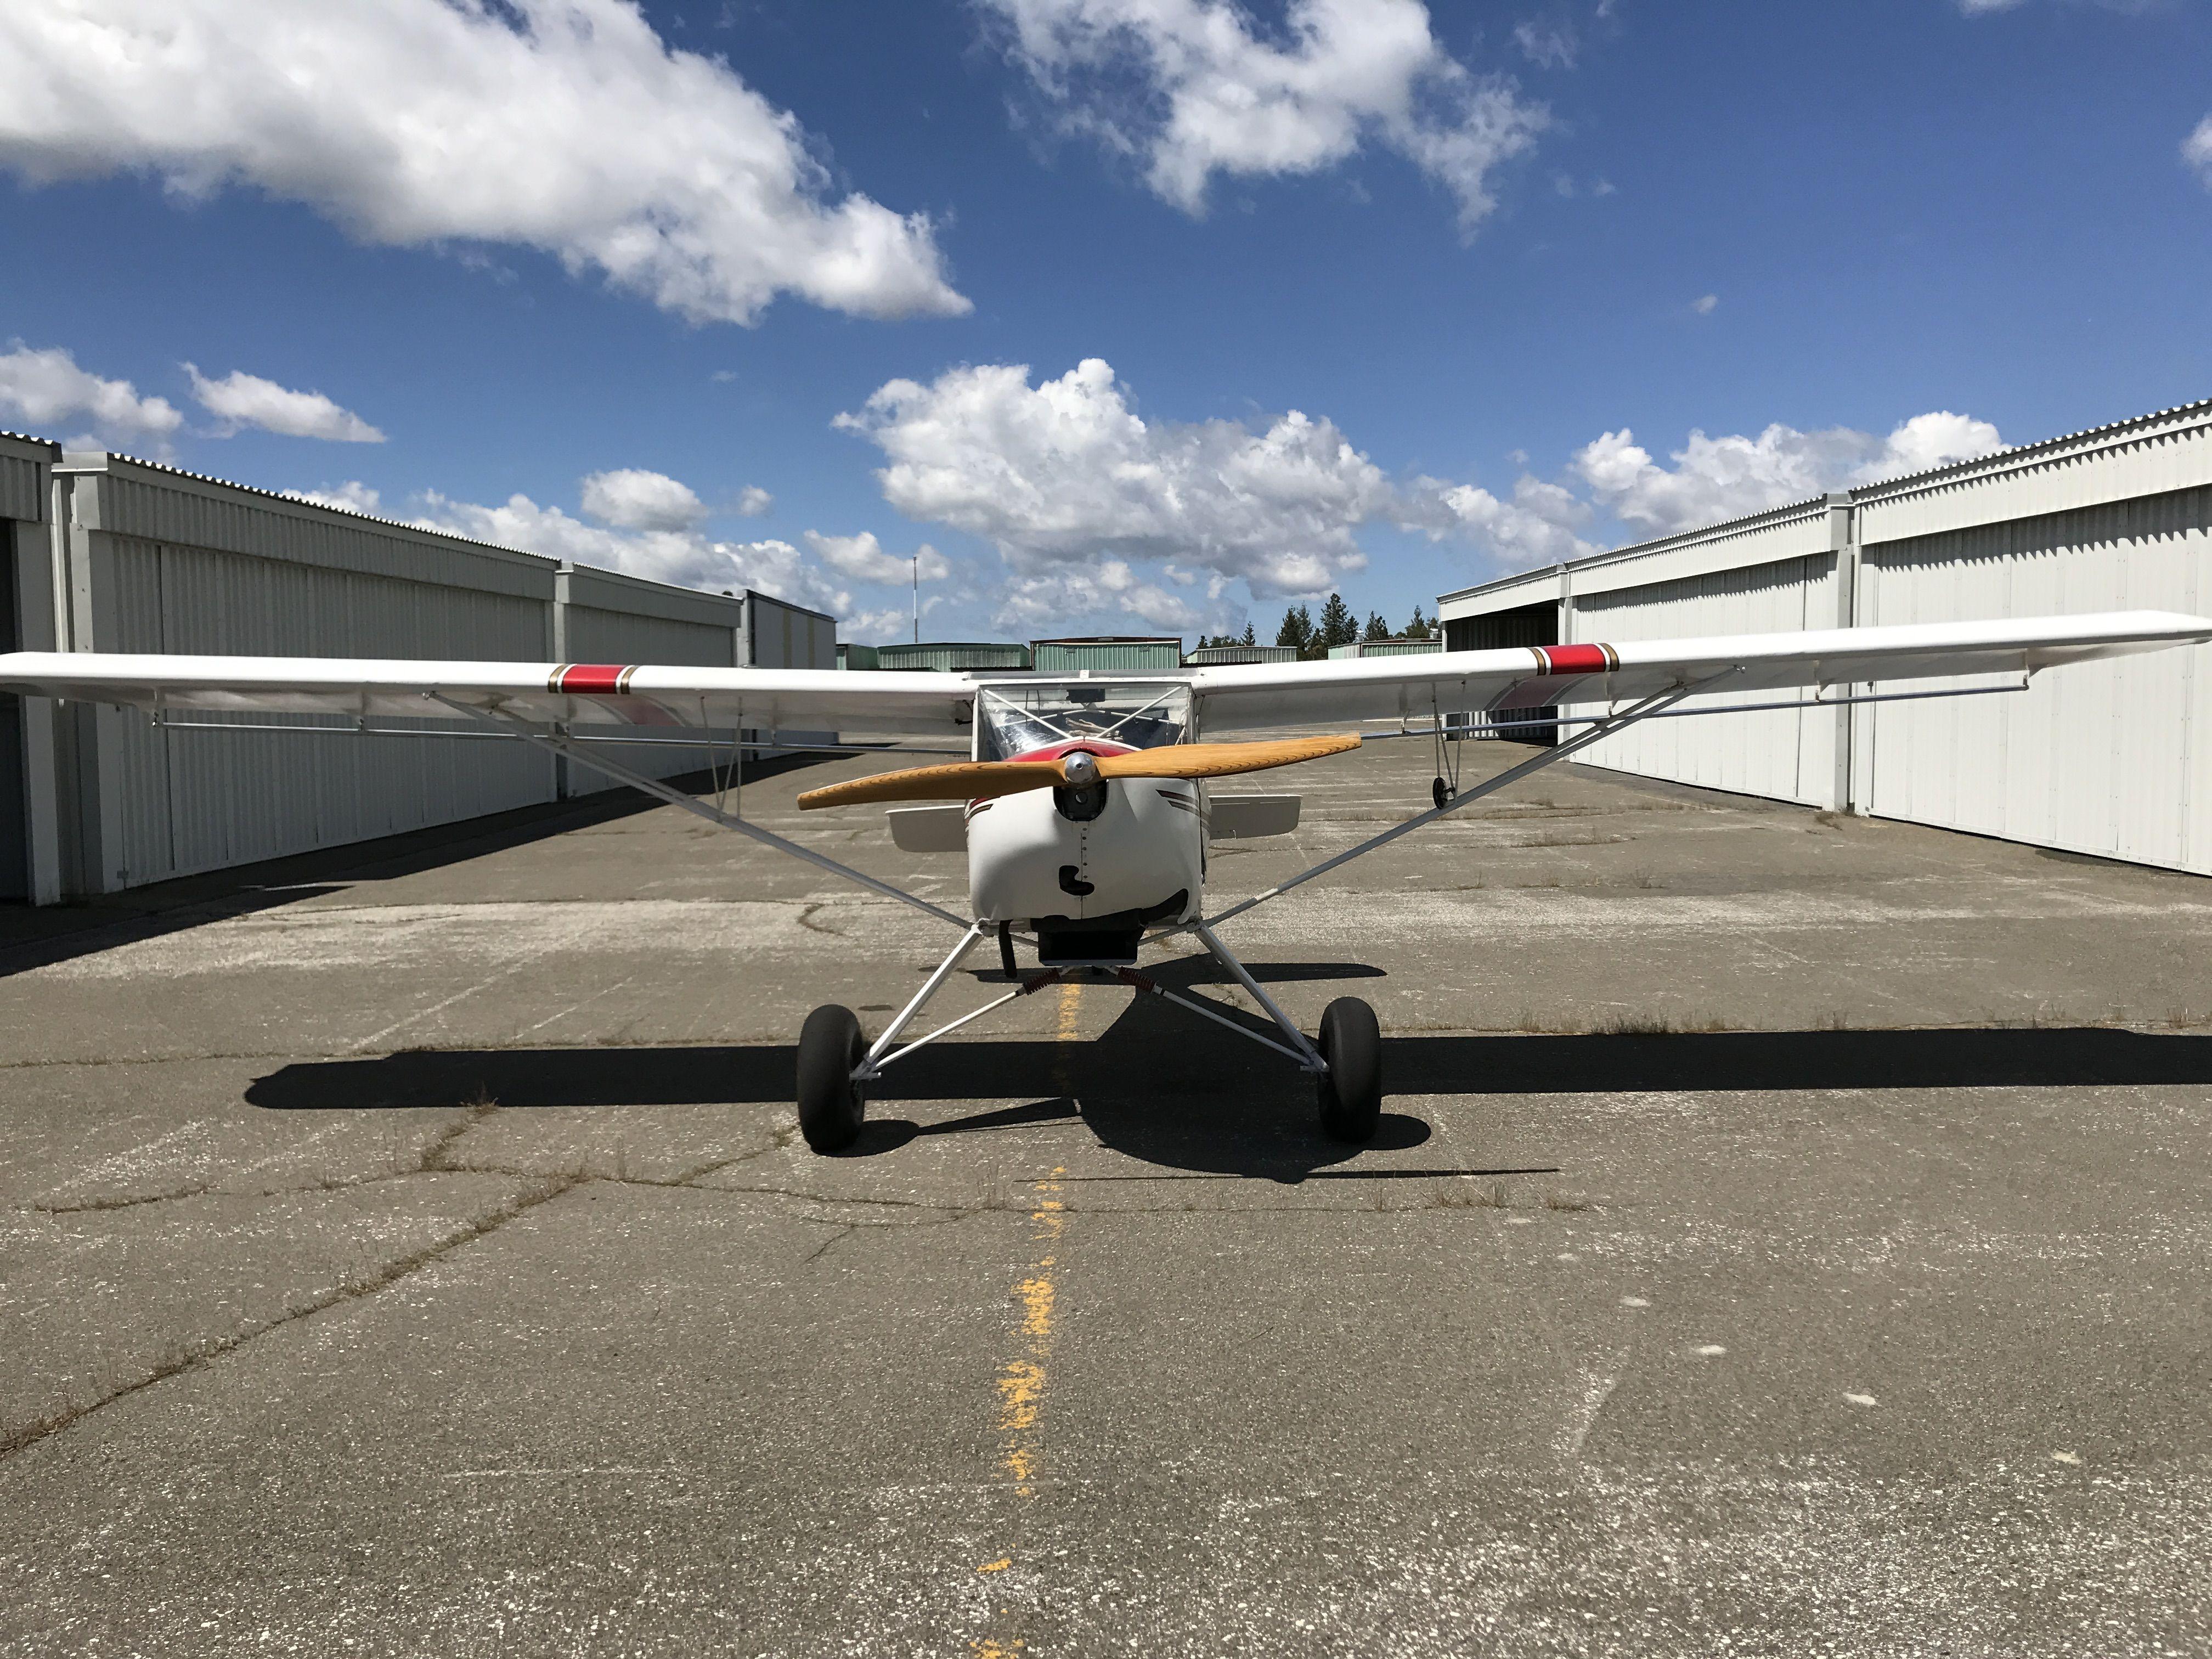 Avid Flyer 582 Model C Kit Planes Bush Plane Aviation World